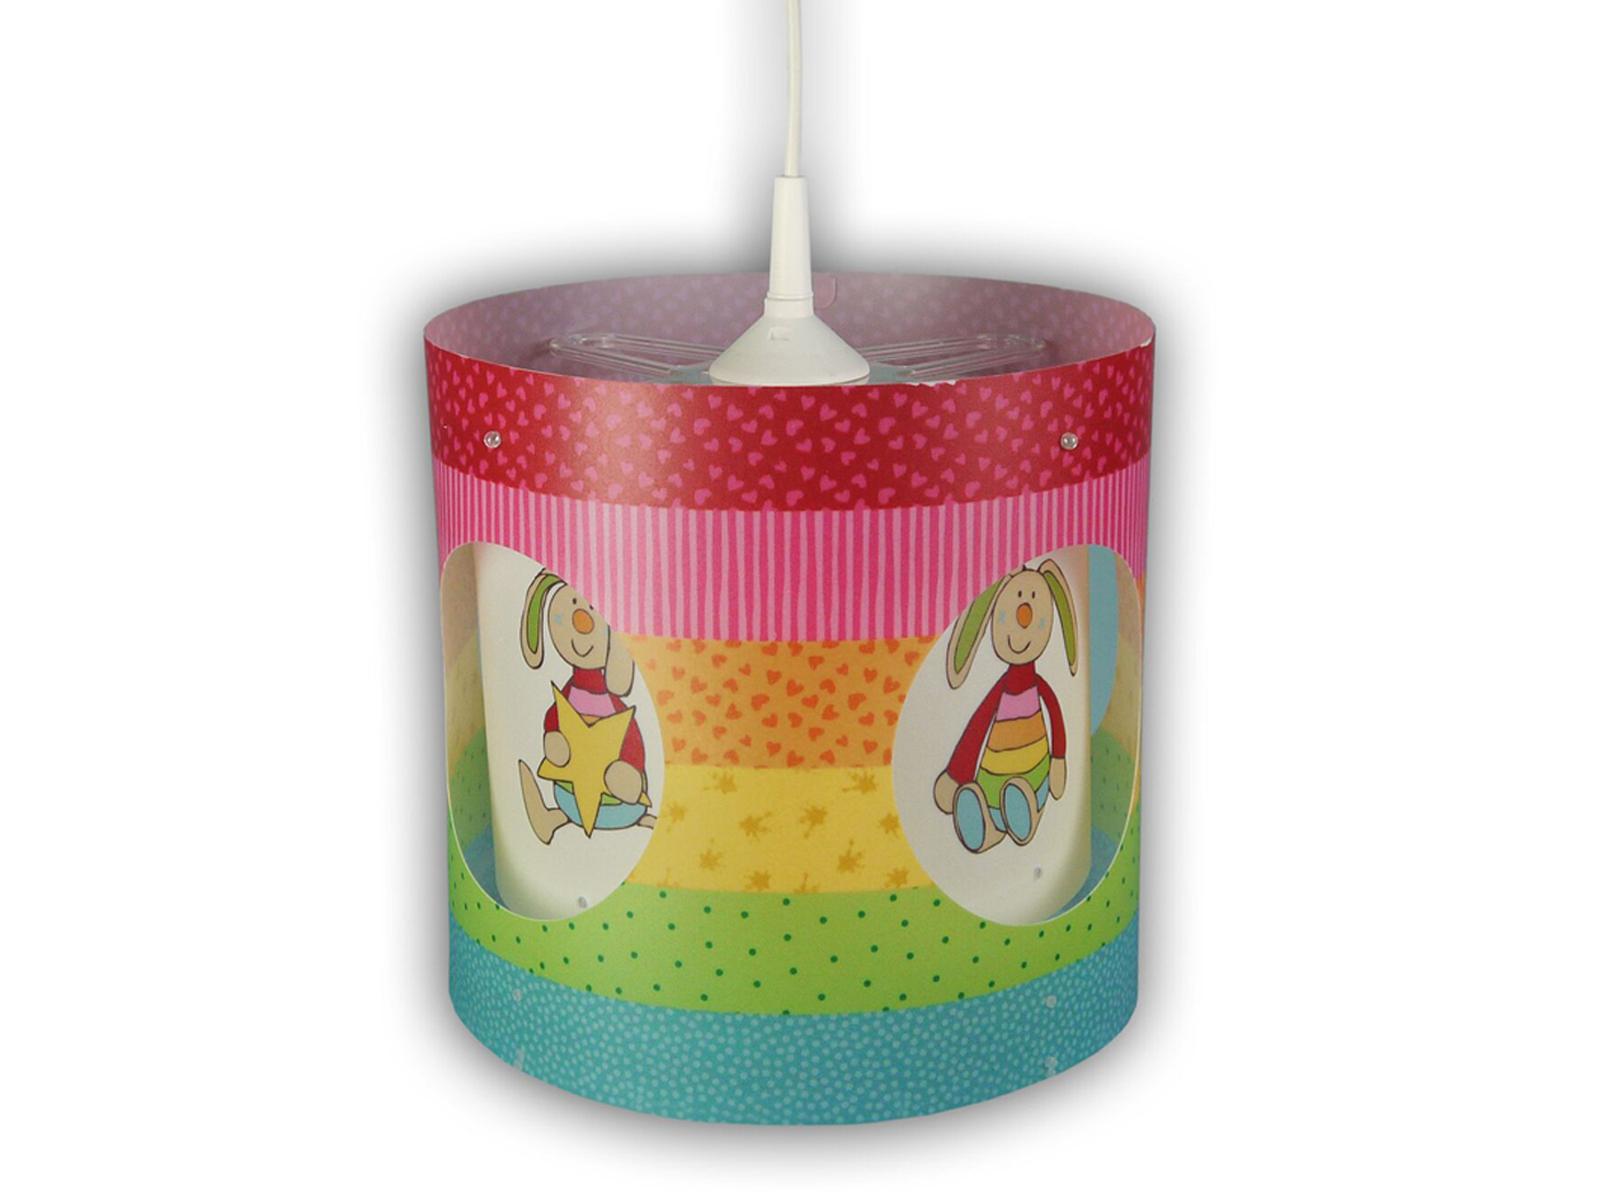 Kinder Pendelleuchte Drehend Lampenschirm Rabbit Motiv Kinderzimmer Lampe Decke